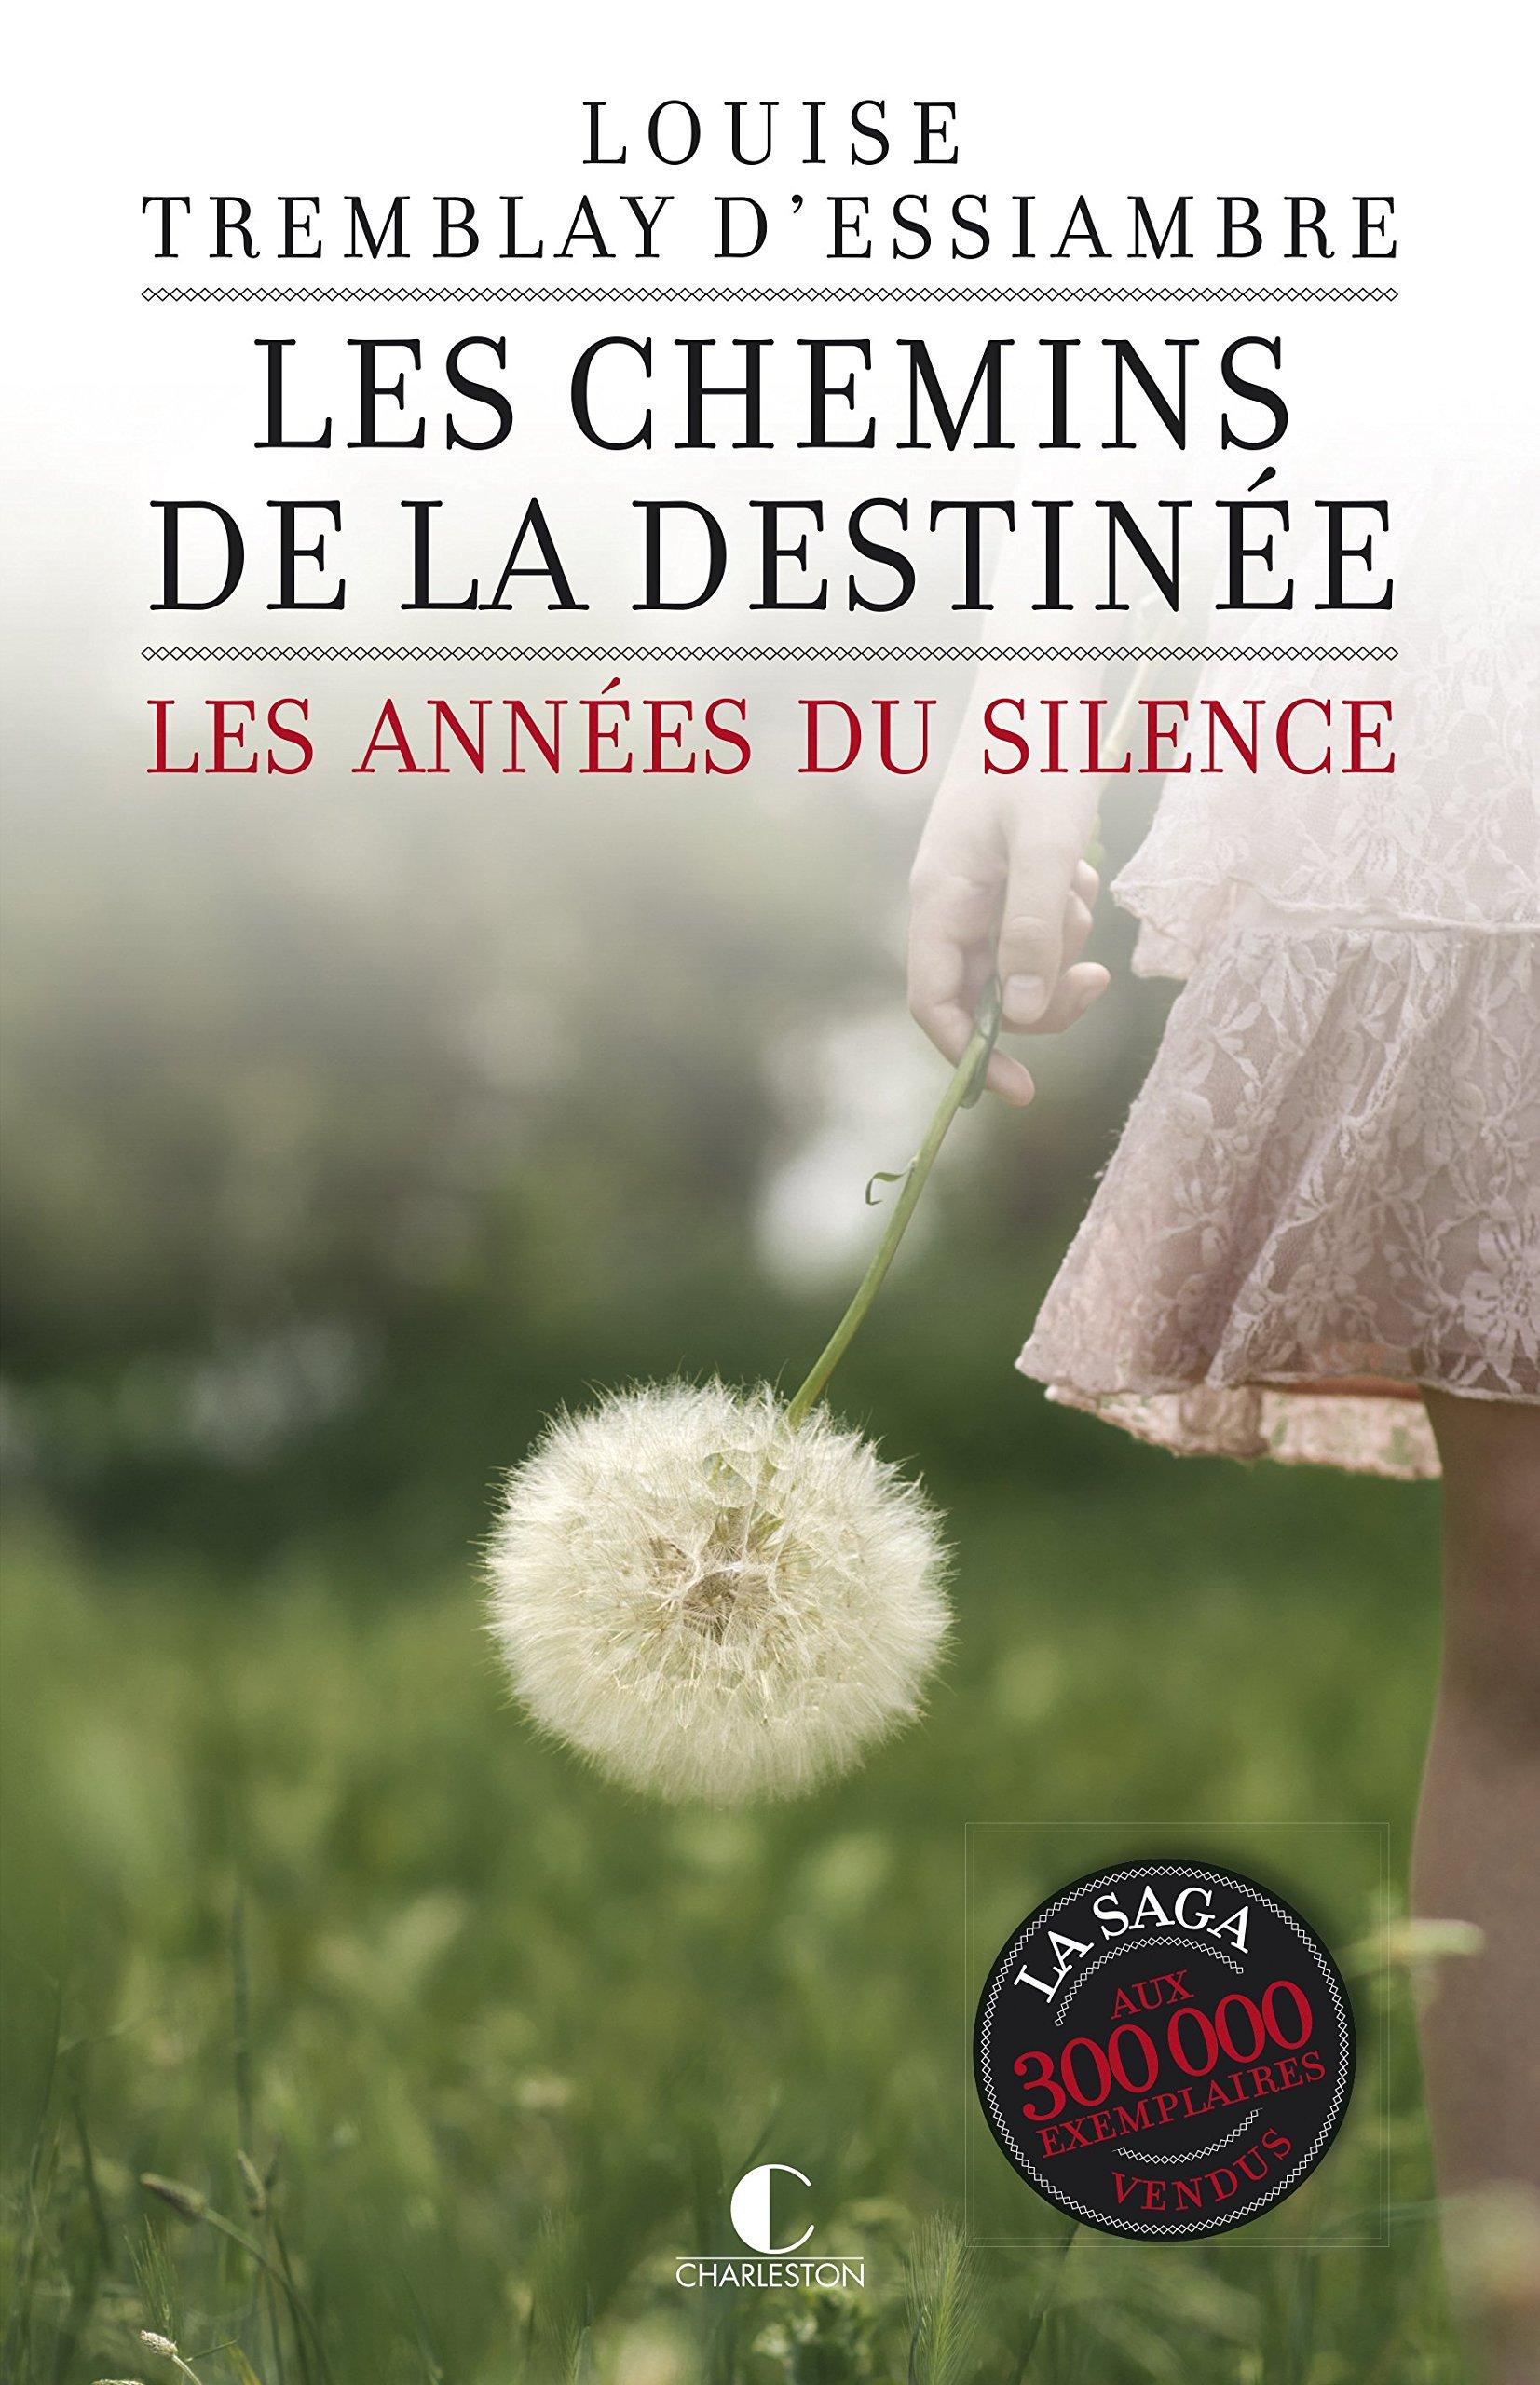 Les Chemins De La Destinee De Louise Tremblay D Essiambre